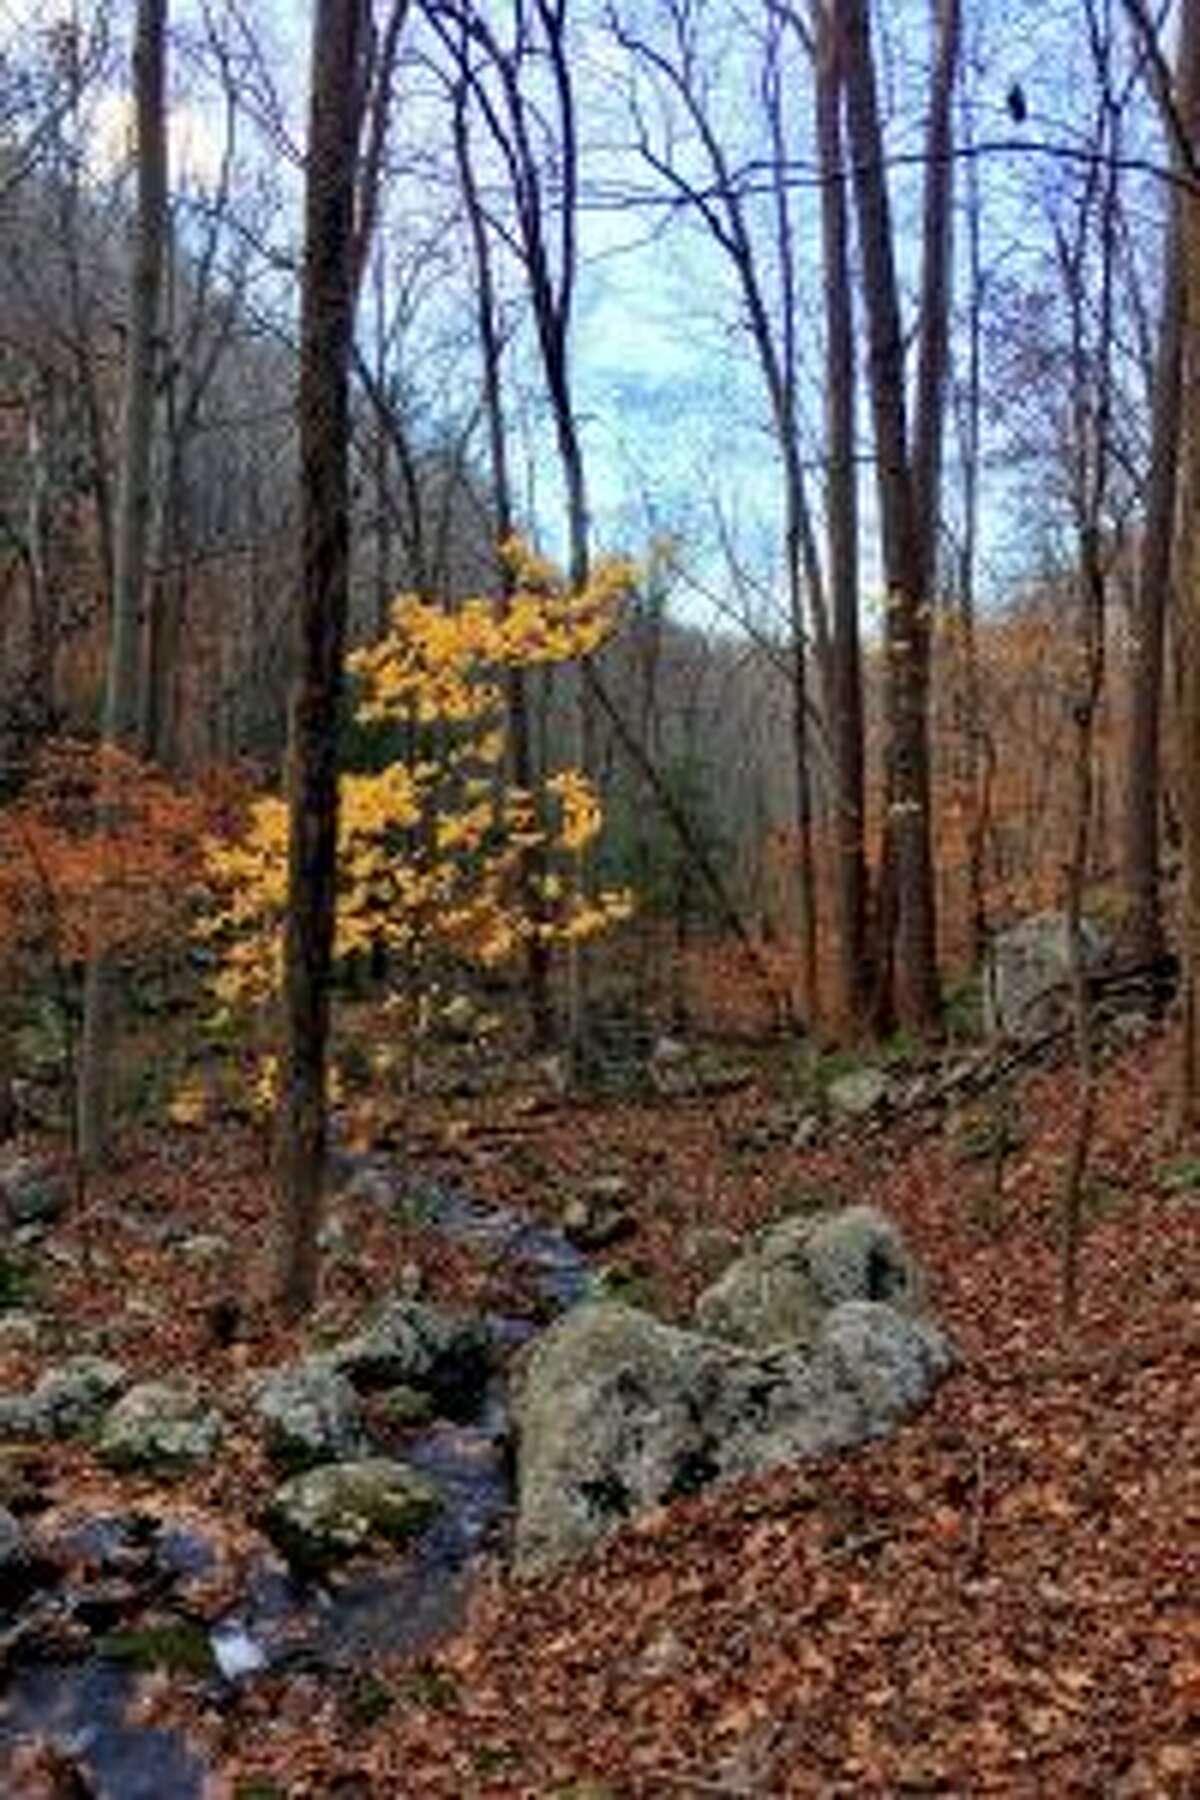 Fall colors in a Hemlock Hills ravine. - Rob McWilliams photo